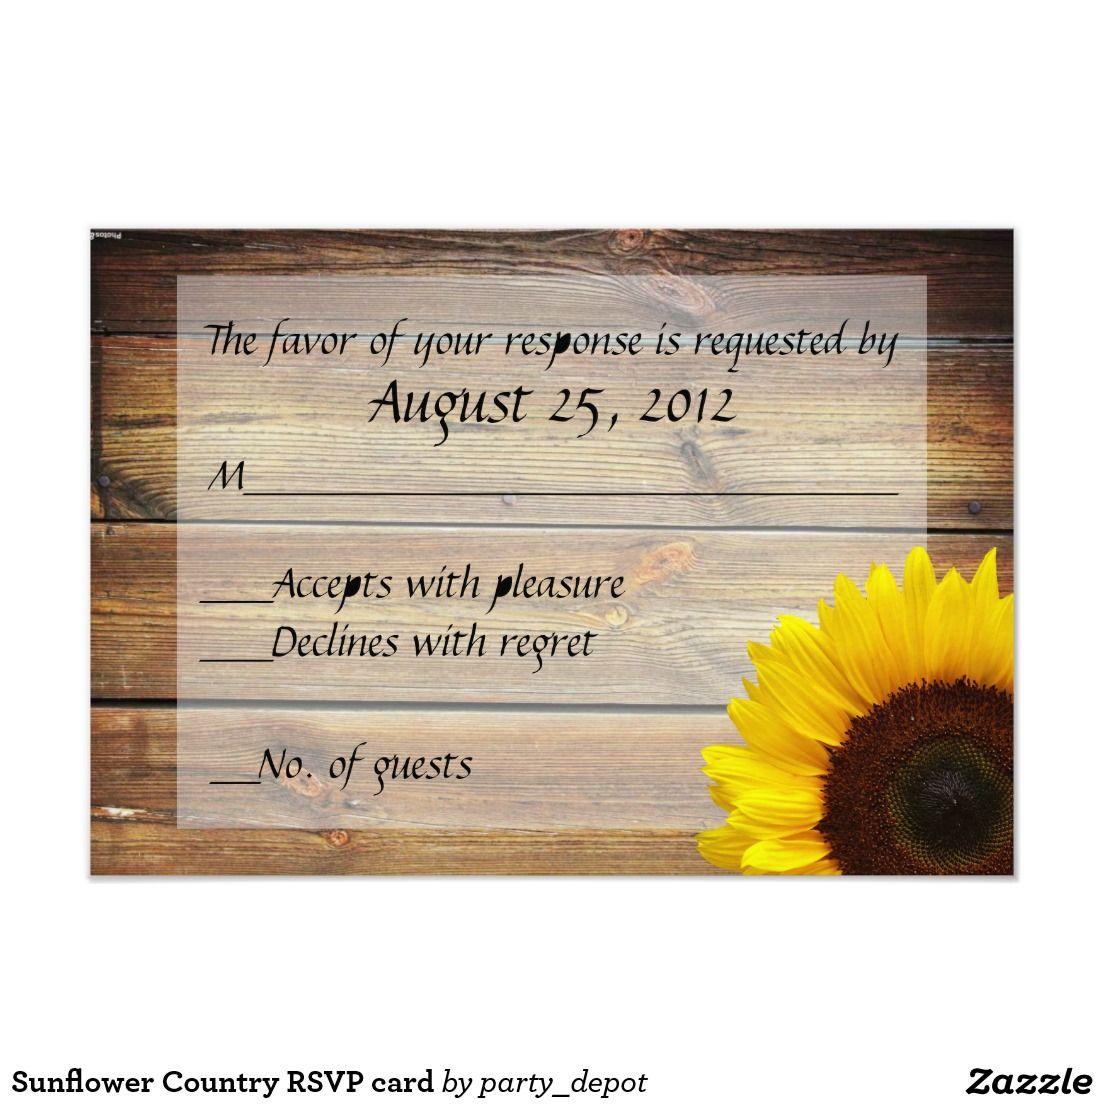 Sunflower Country RSVP card Sunflower